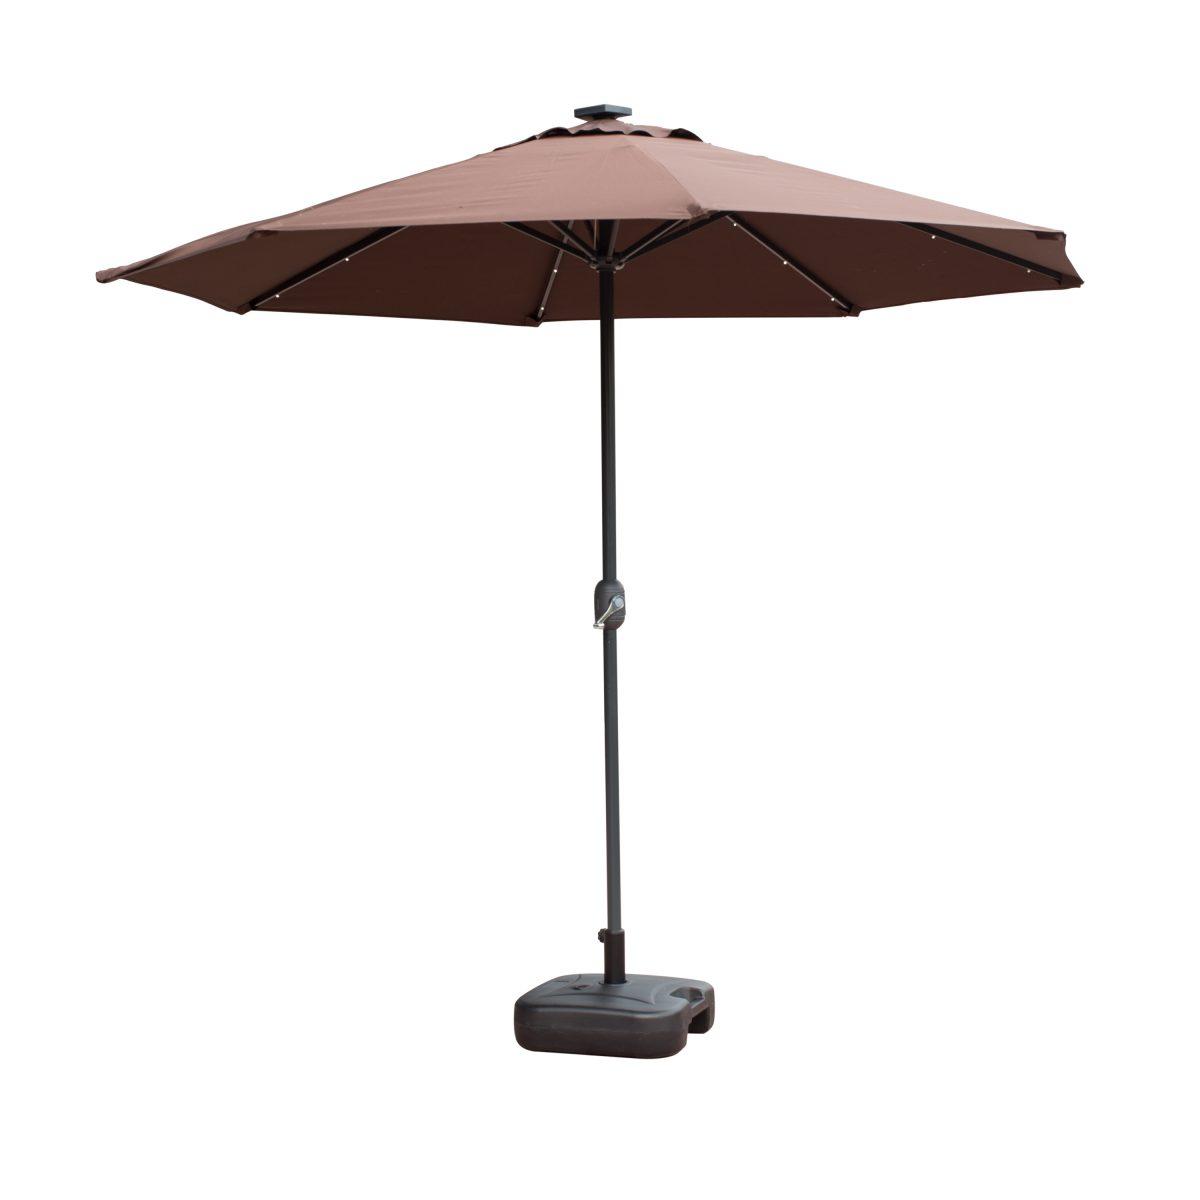 Borealis 9 Foot 30 LED Lights Coffee Patio Umbrella Garden Outdoor Sunshade  Market